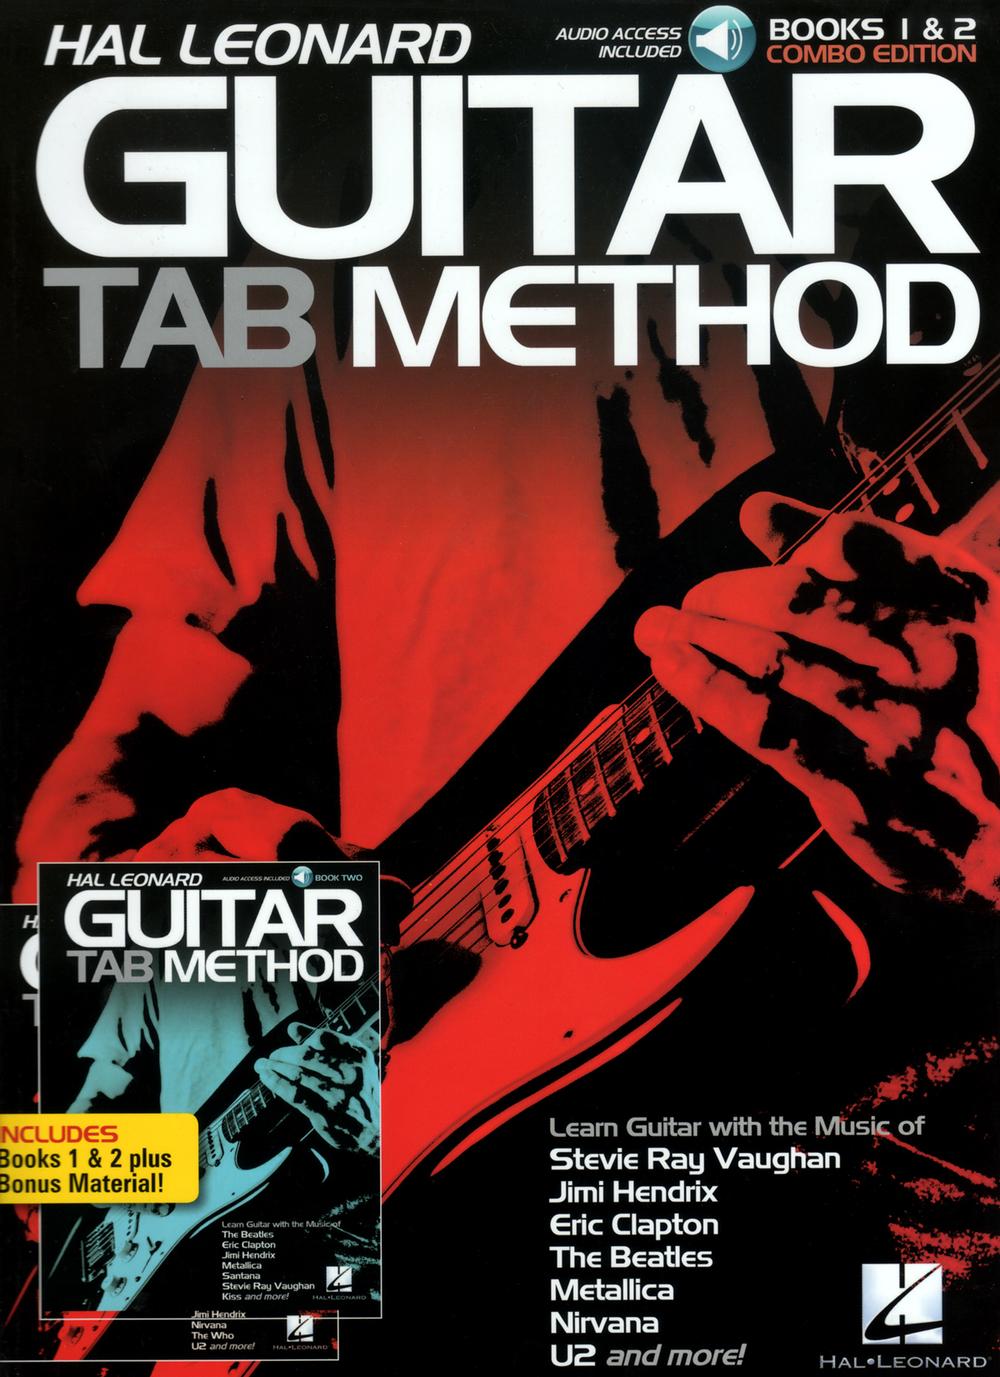 Hal Leonard Guitar Tab Method Books 1and 2 Combo Edition Books